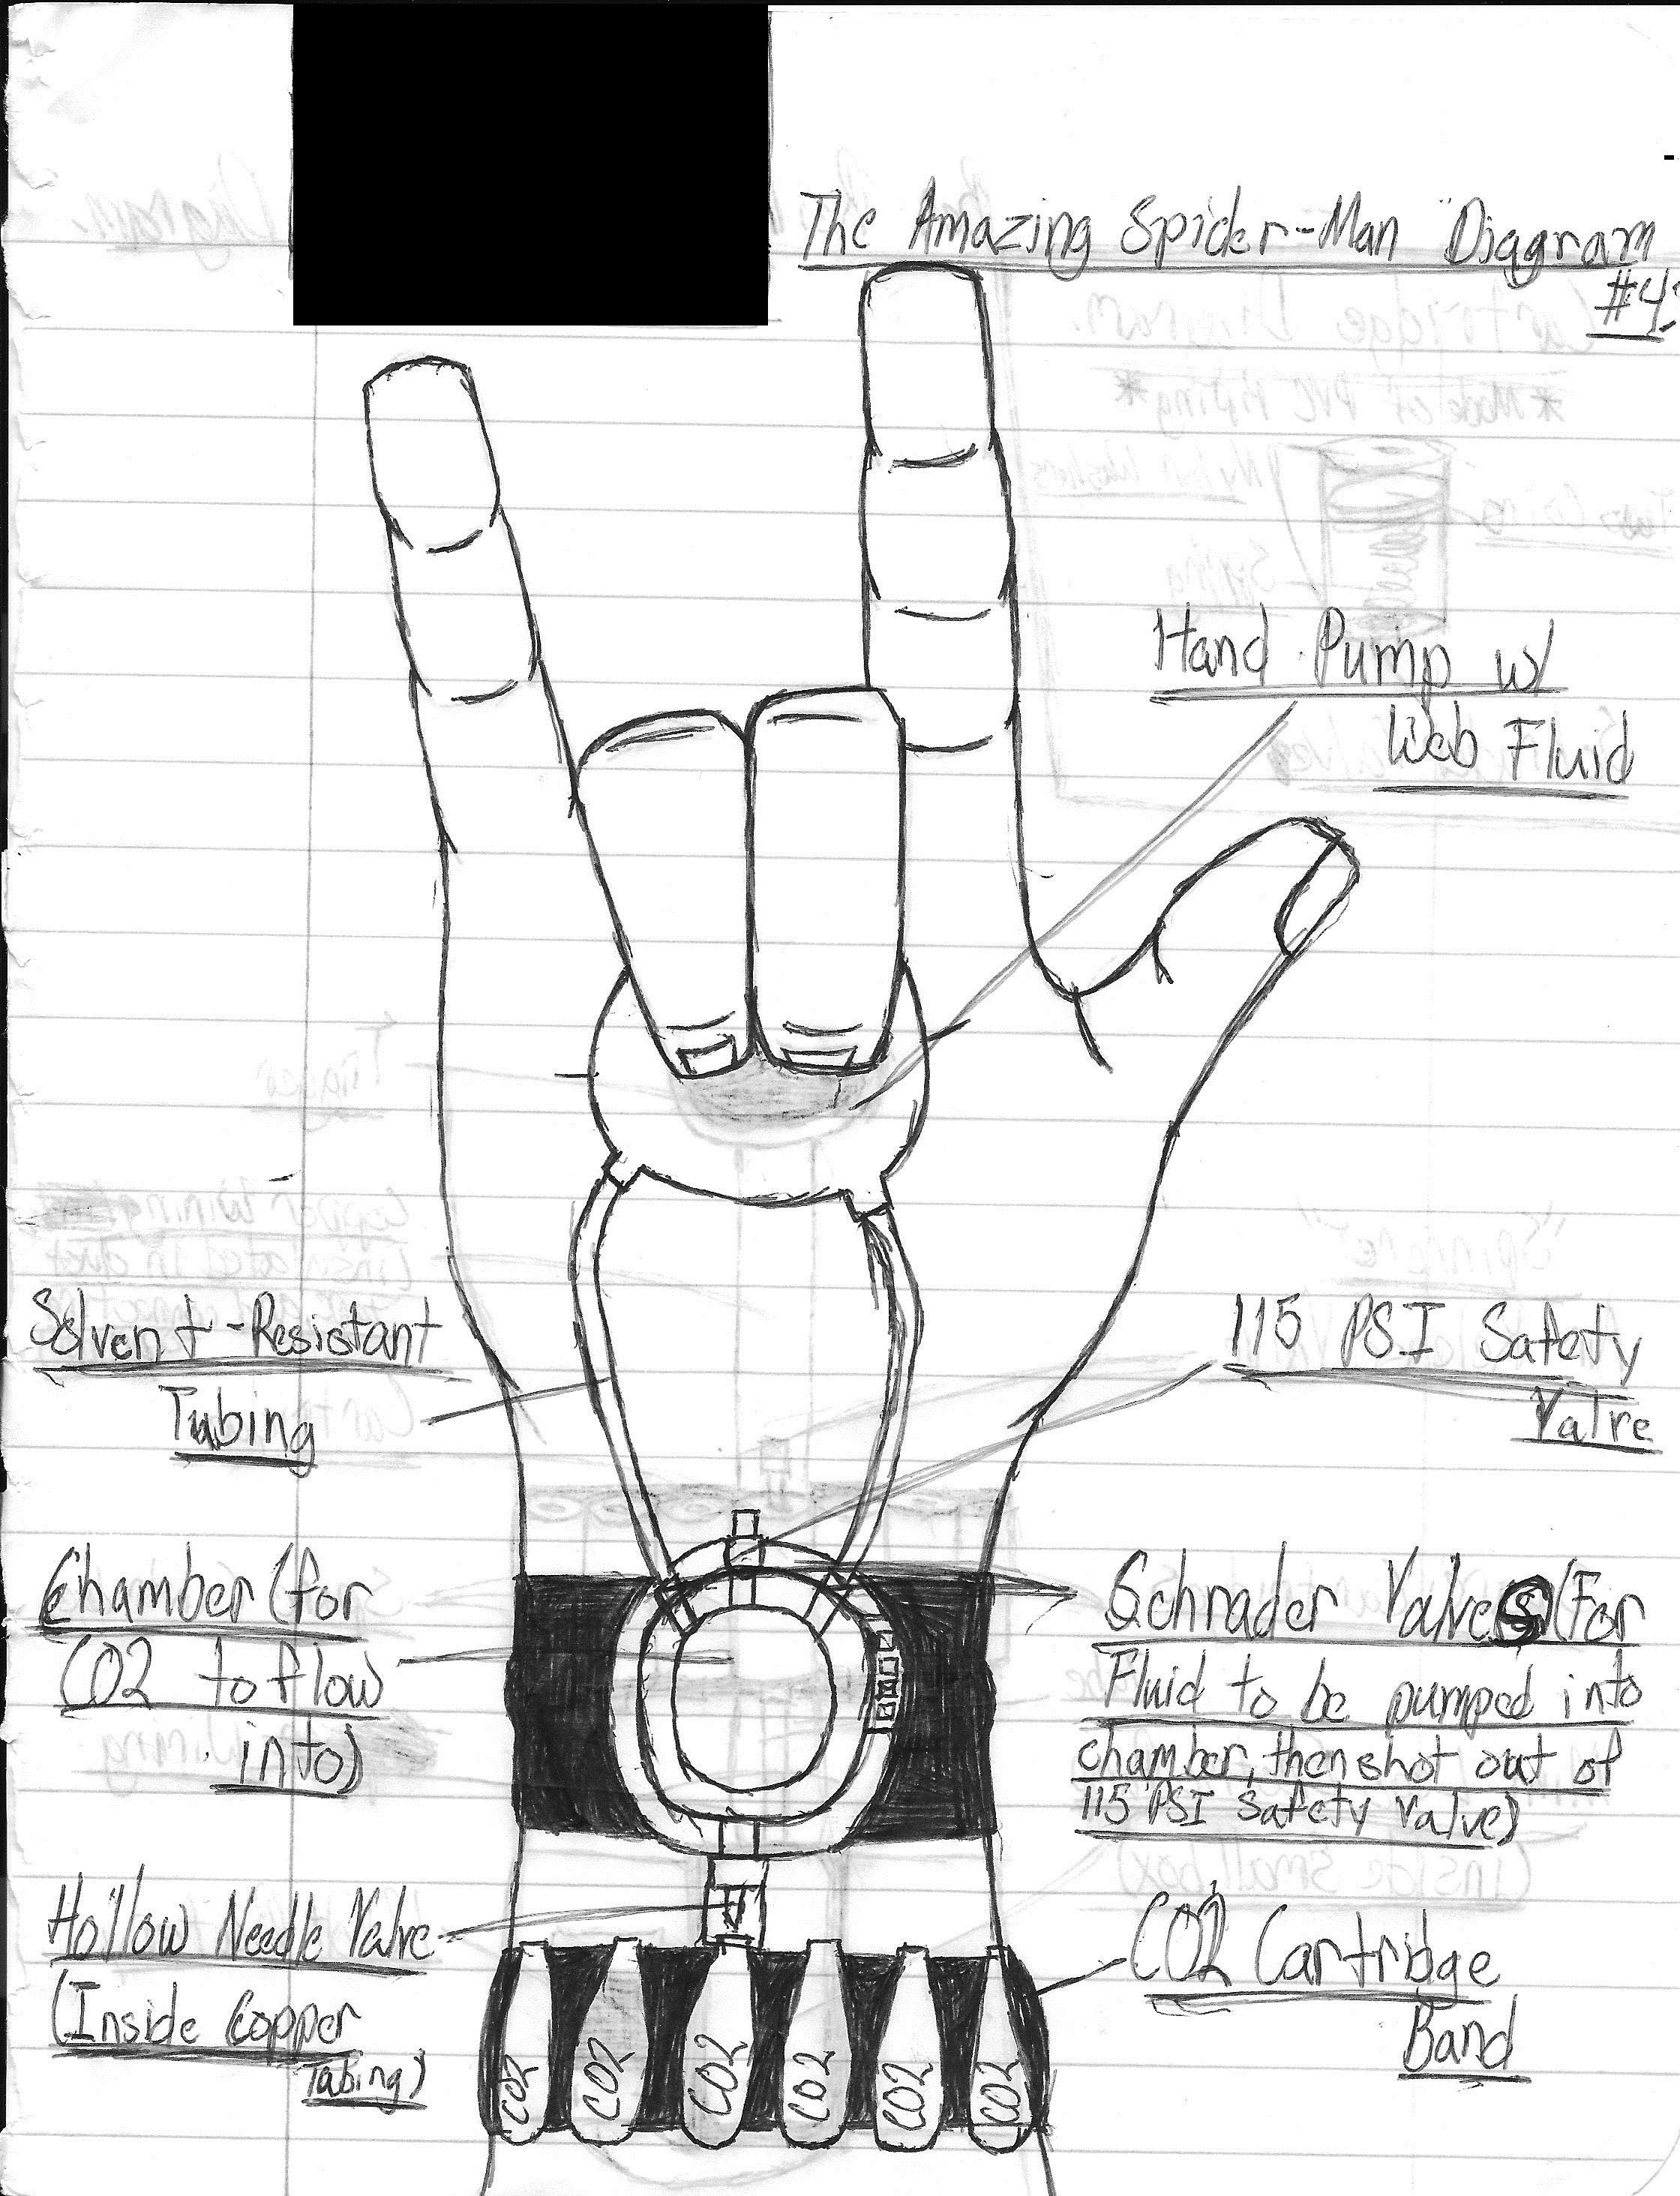 The amazing spider man diagram by marvelfan22 on deviantart for Web design blueprints